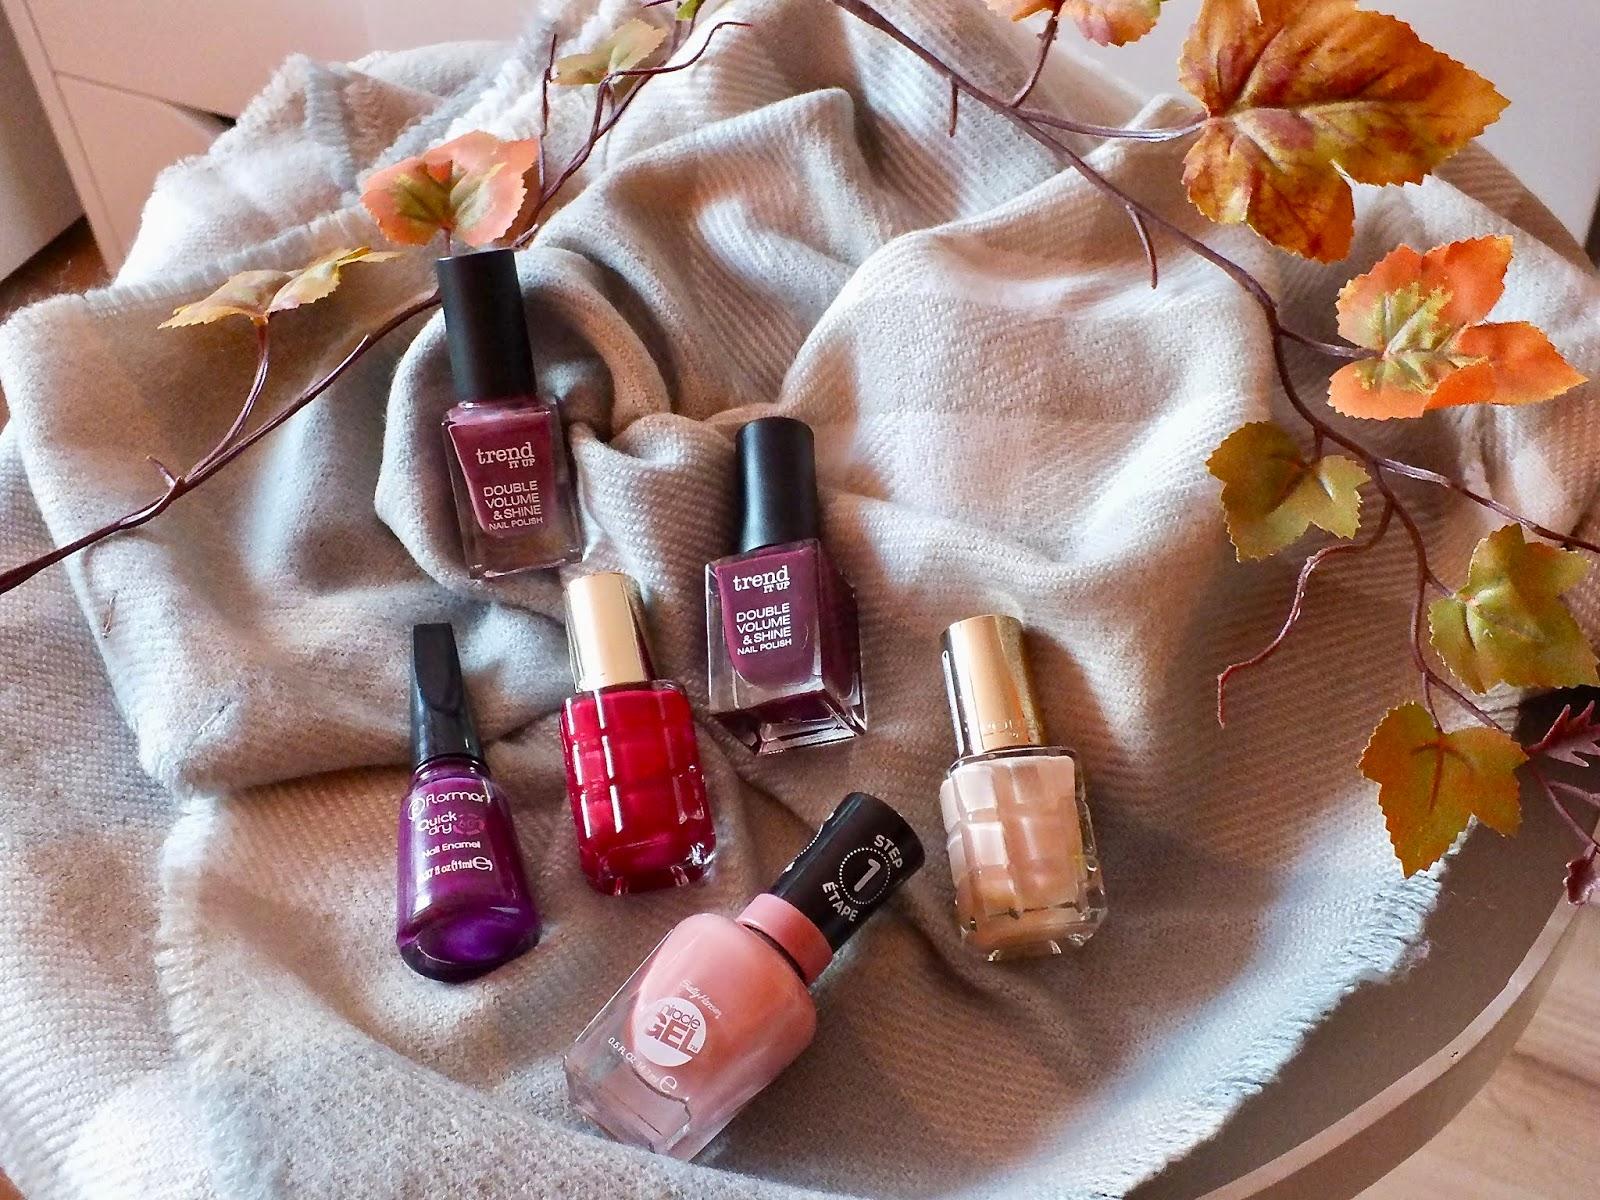 Lady Twig Podzimni Laky Na Nehty Trend It Up Flormar Sally Hansen L Oreal